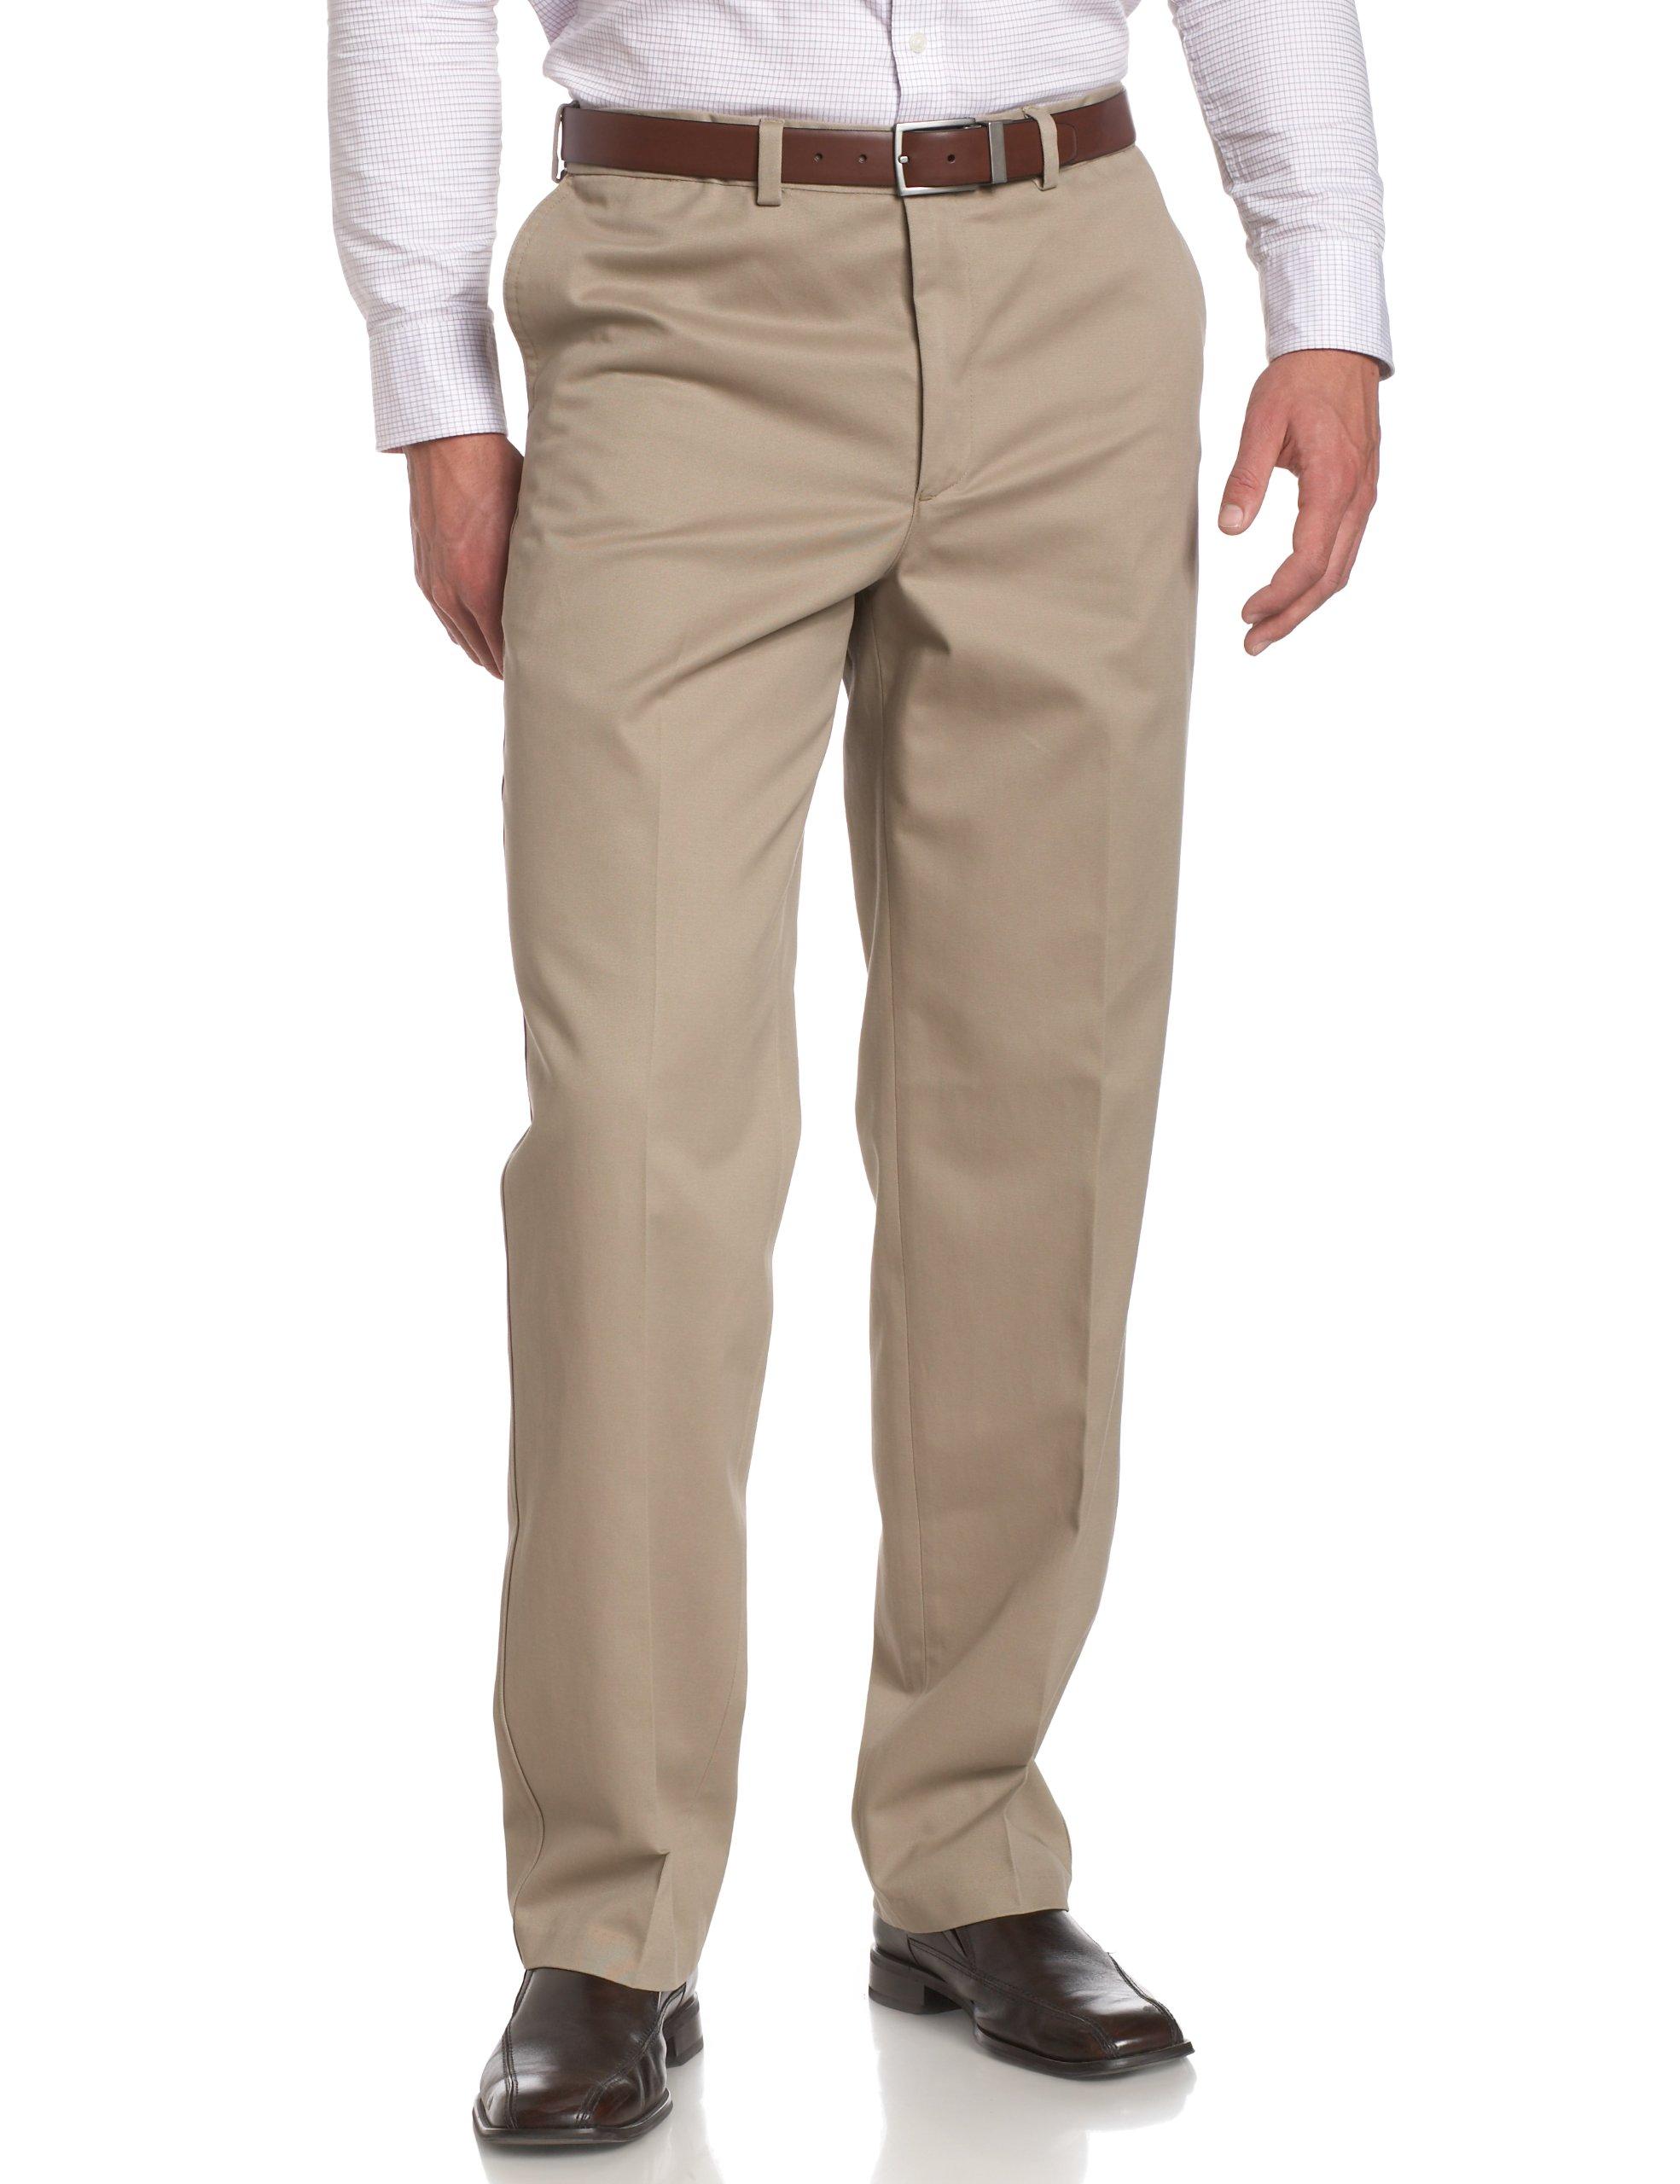 Savane Men's Flat Front Wrinkle Free Twill,Khaki,36W 32L